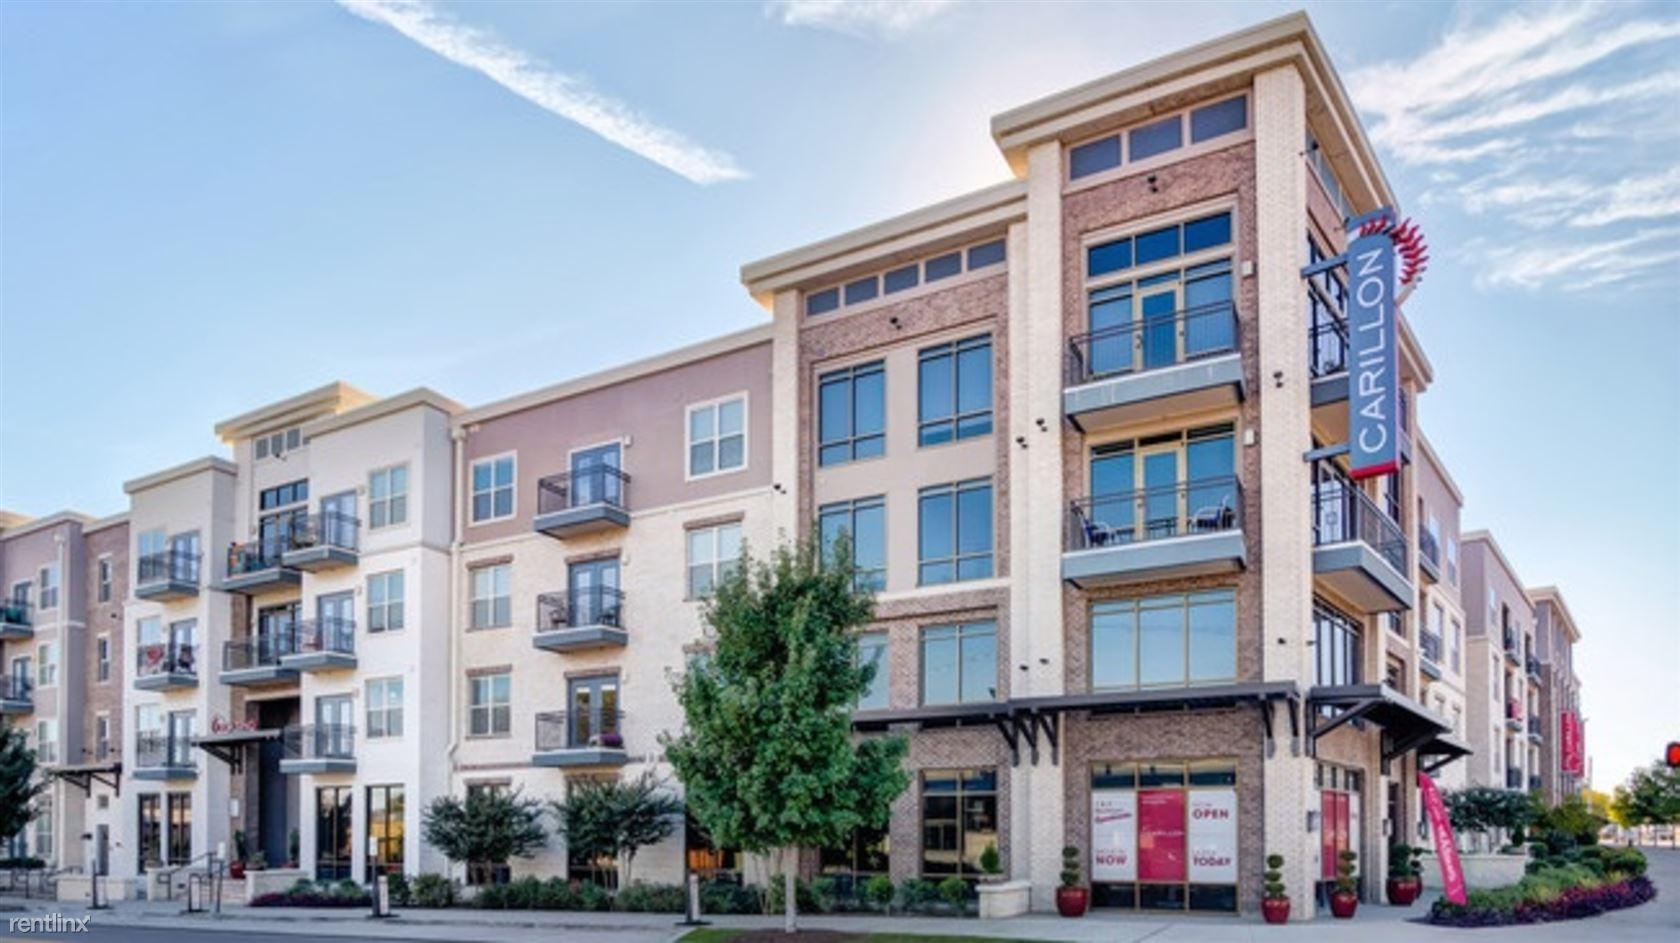 Apartment for Rent in Nashville